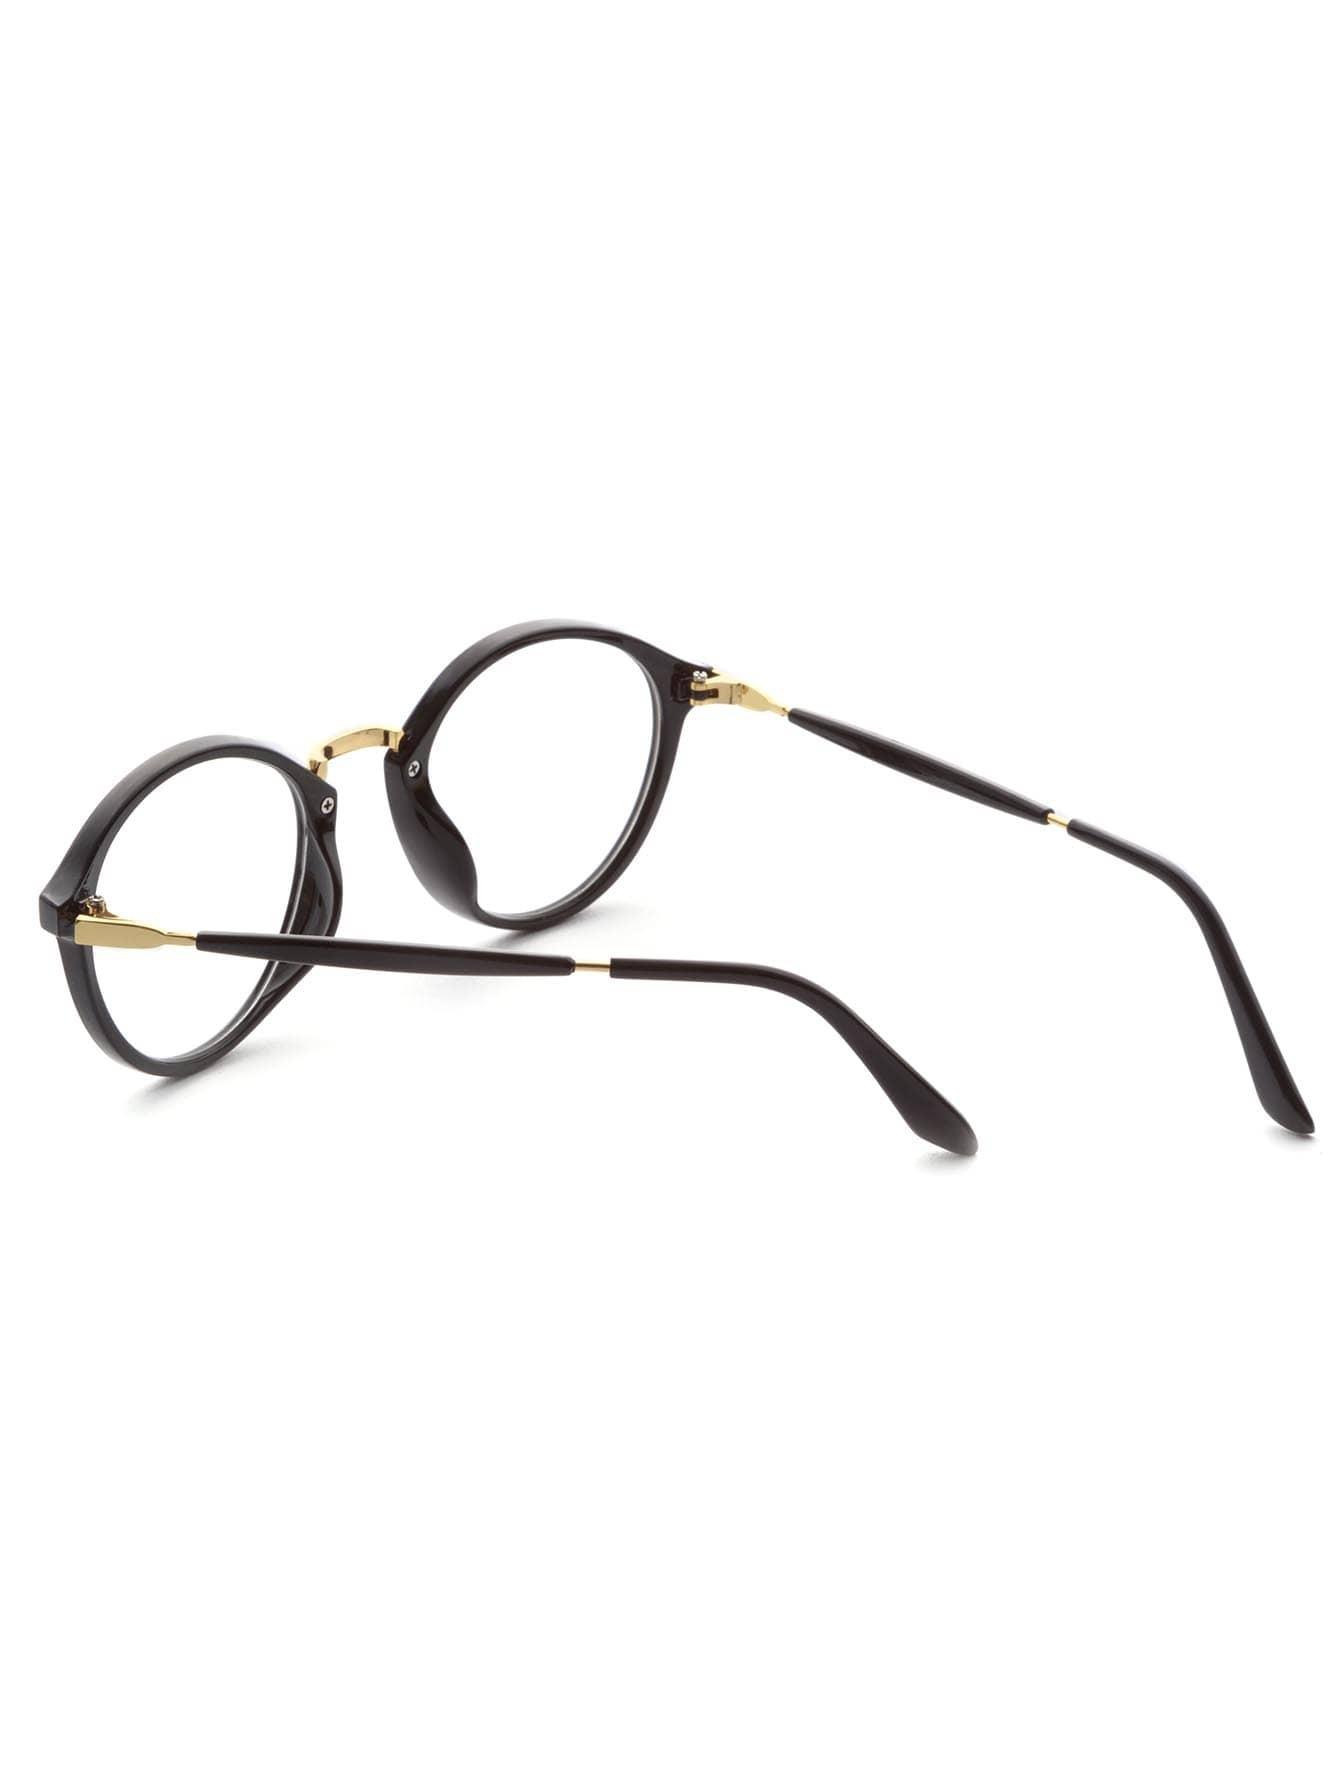 Black Frame Gold Trim Glasses